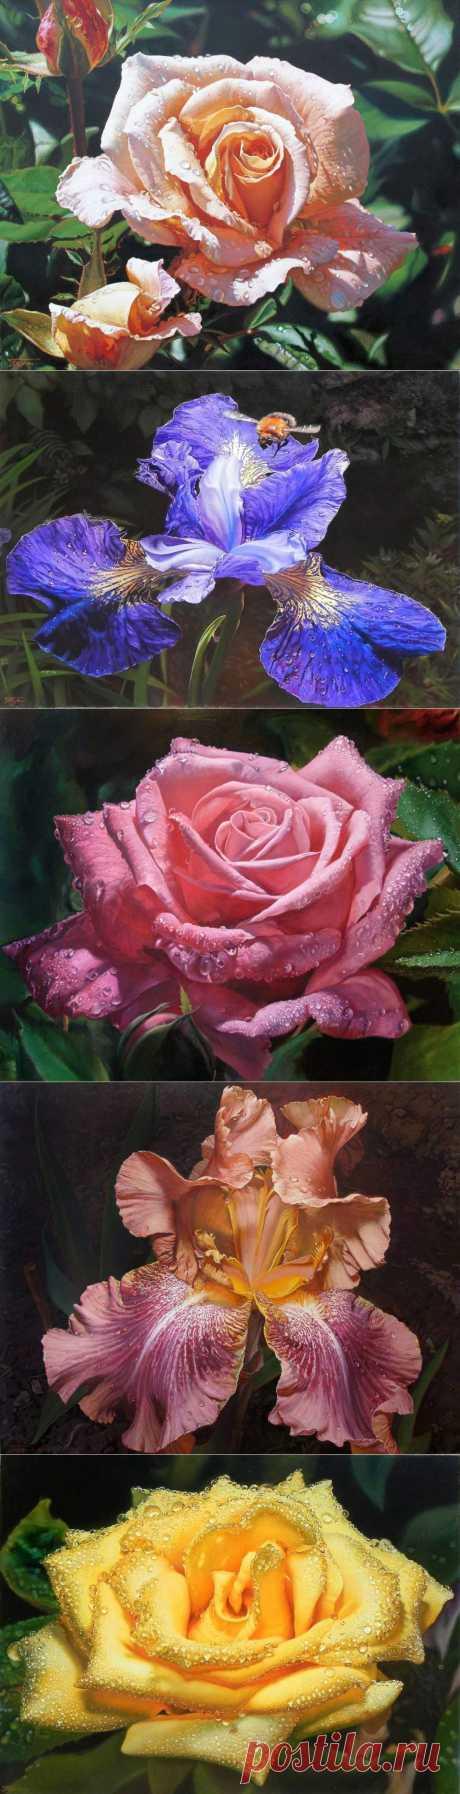 Oleg Turchin | Люблю цветы -они как настроенье....